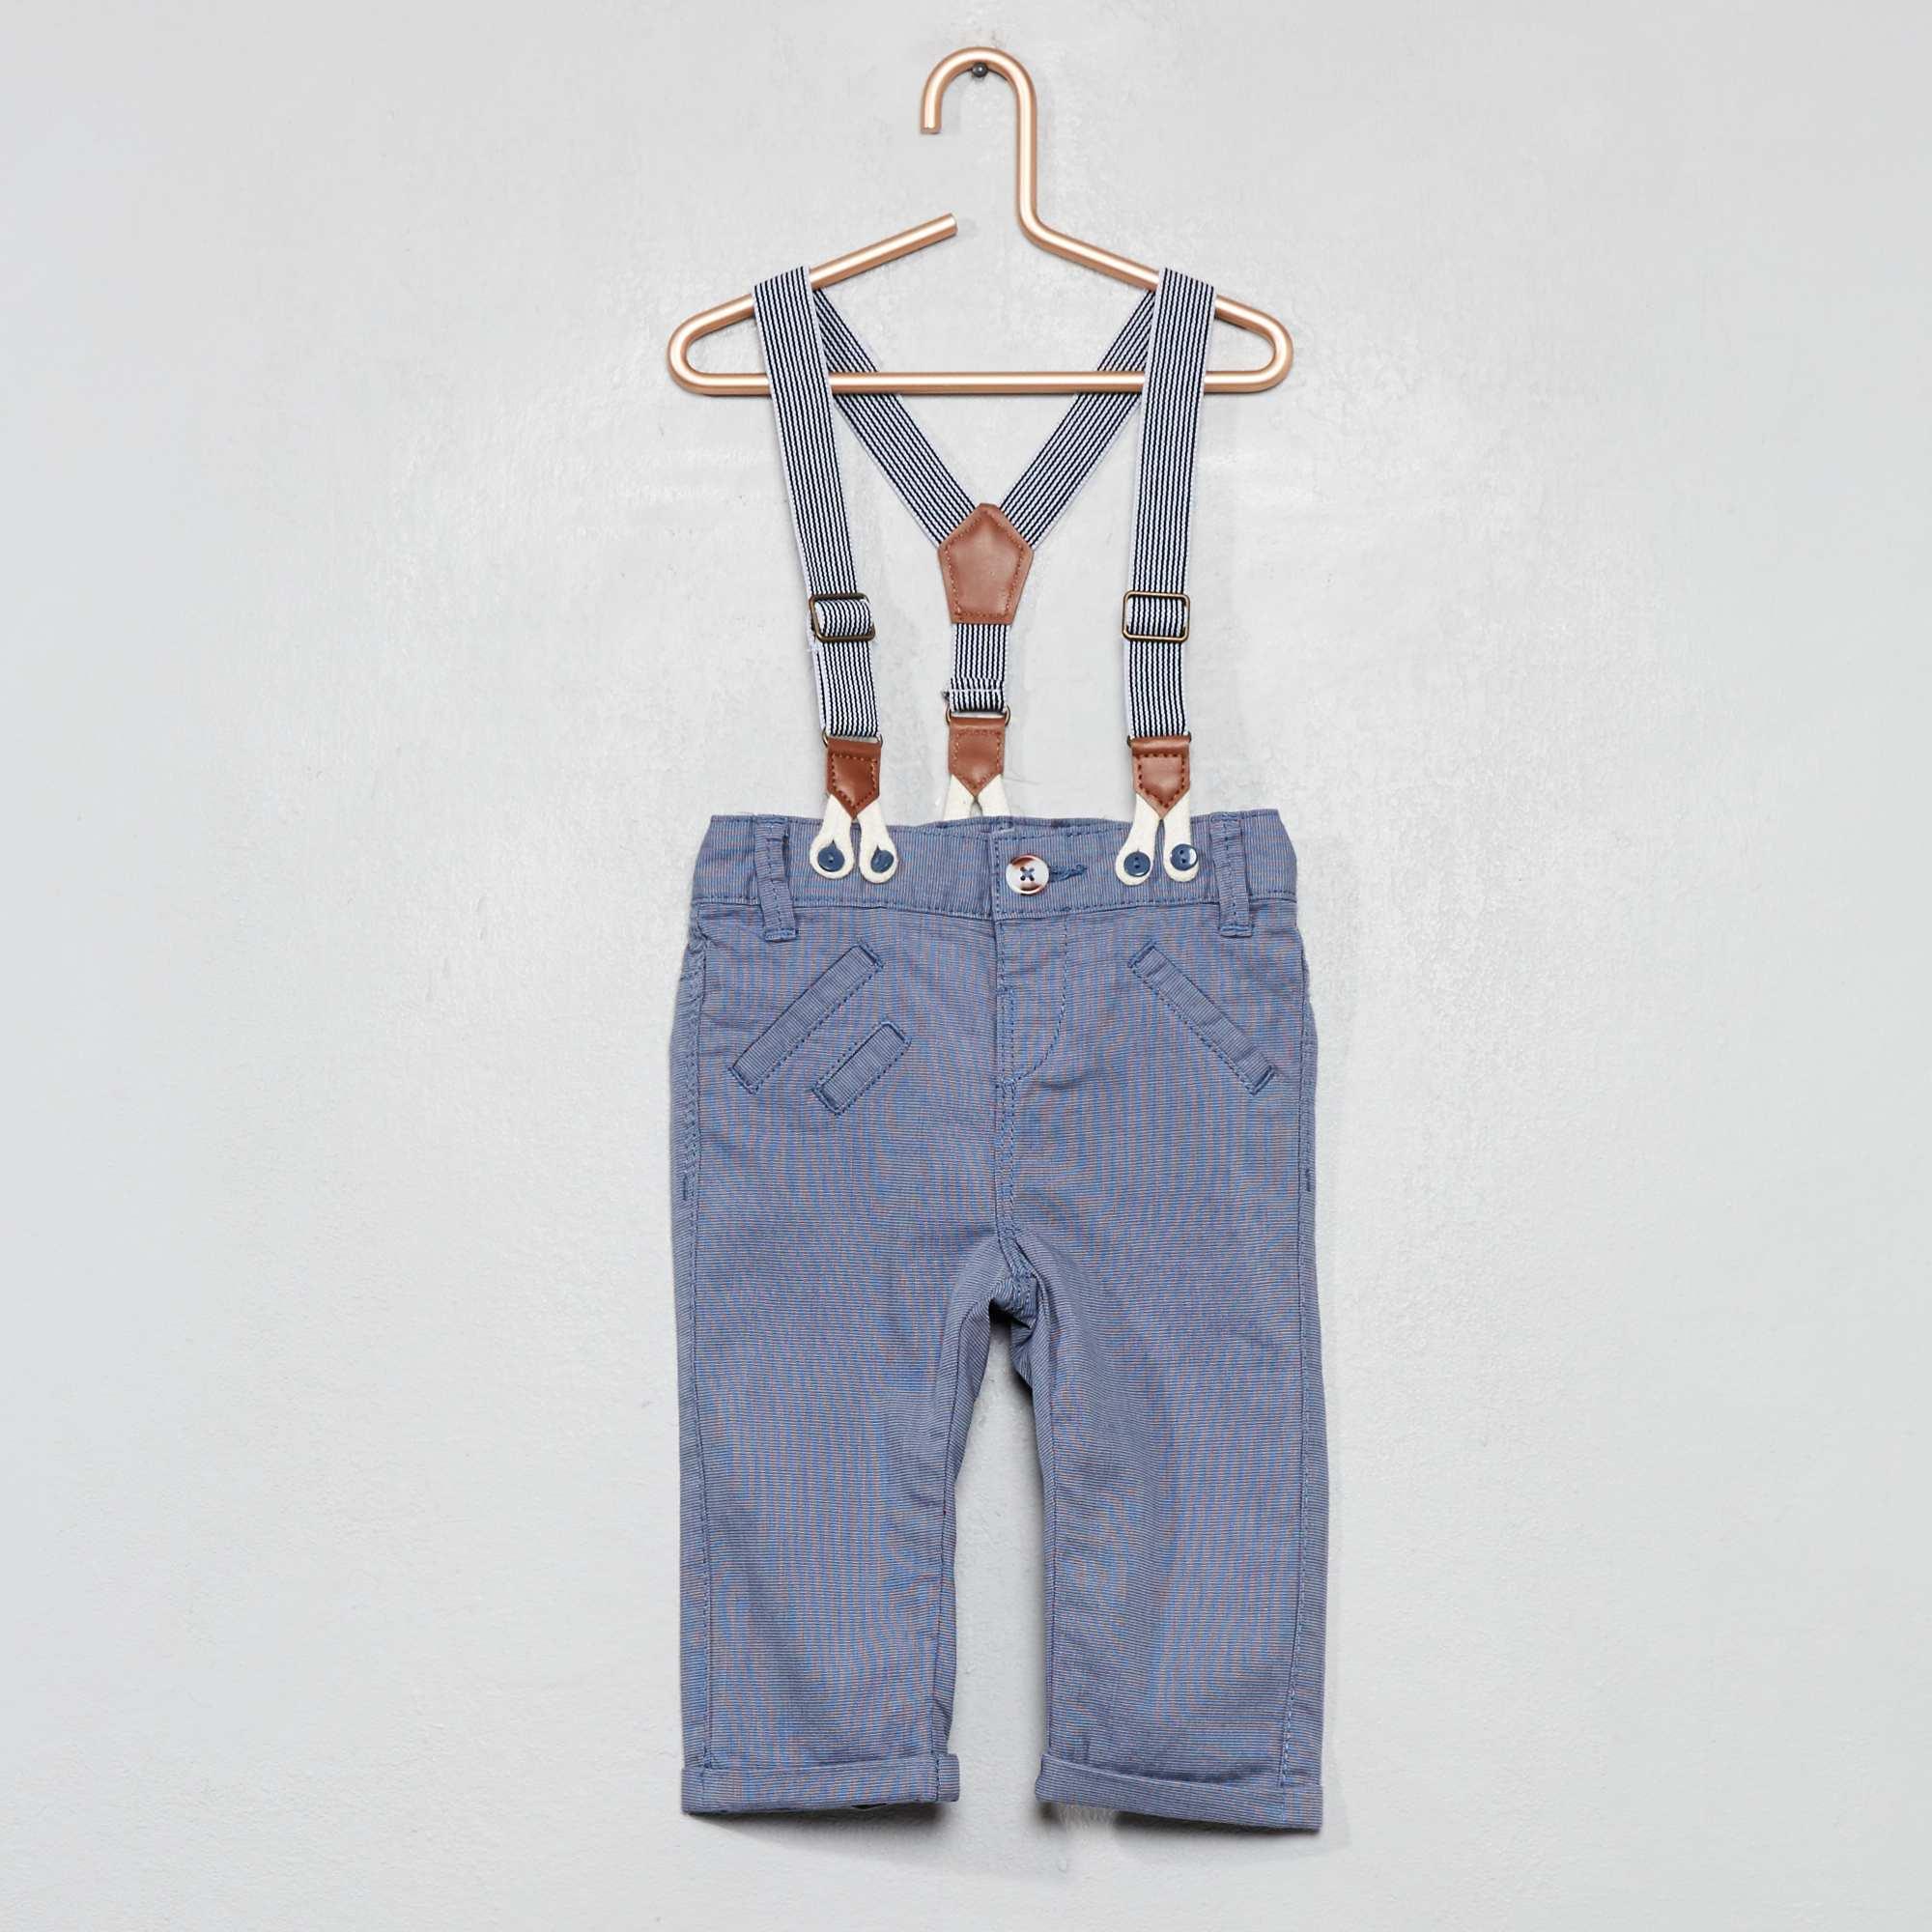 324f30ad1 Pantalón con tirantes Bebé niño - AZUL - Kiabi - 15